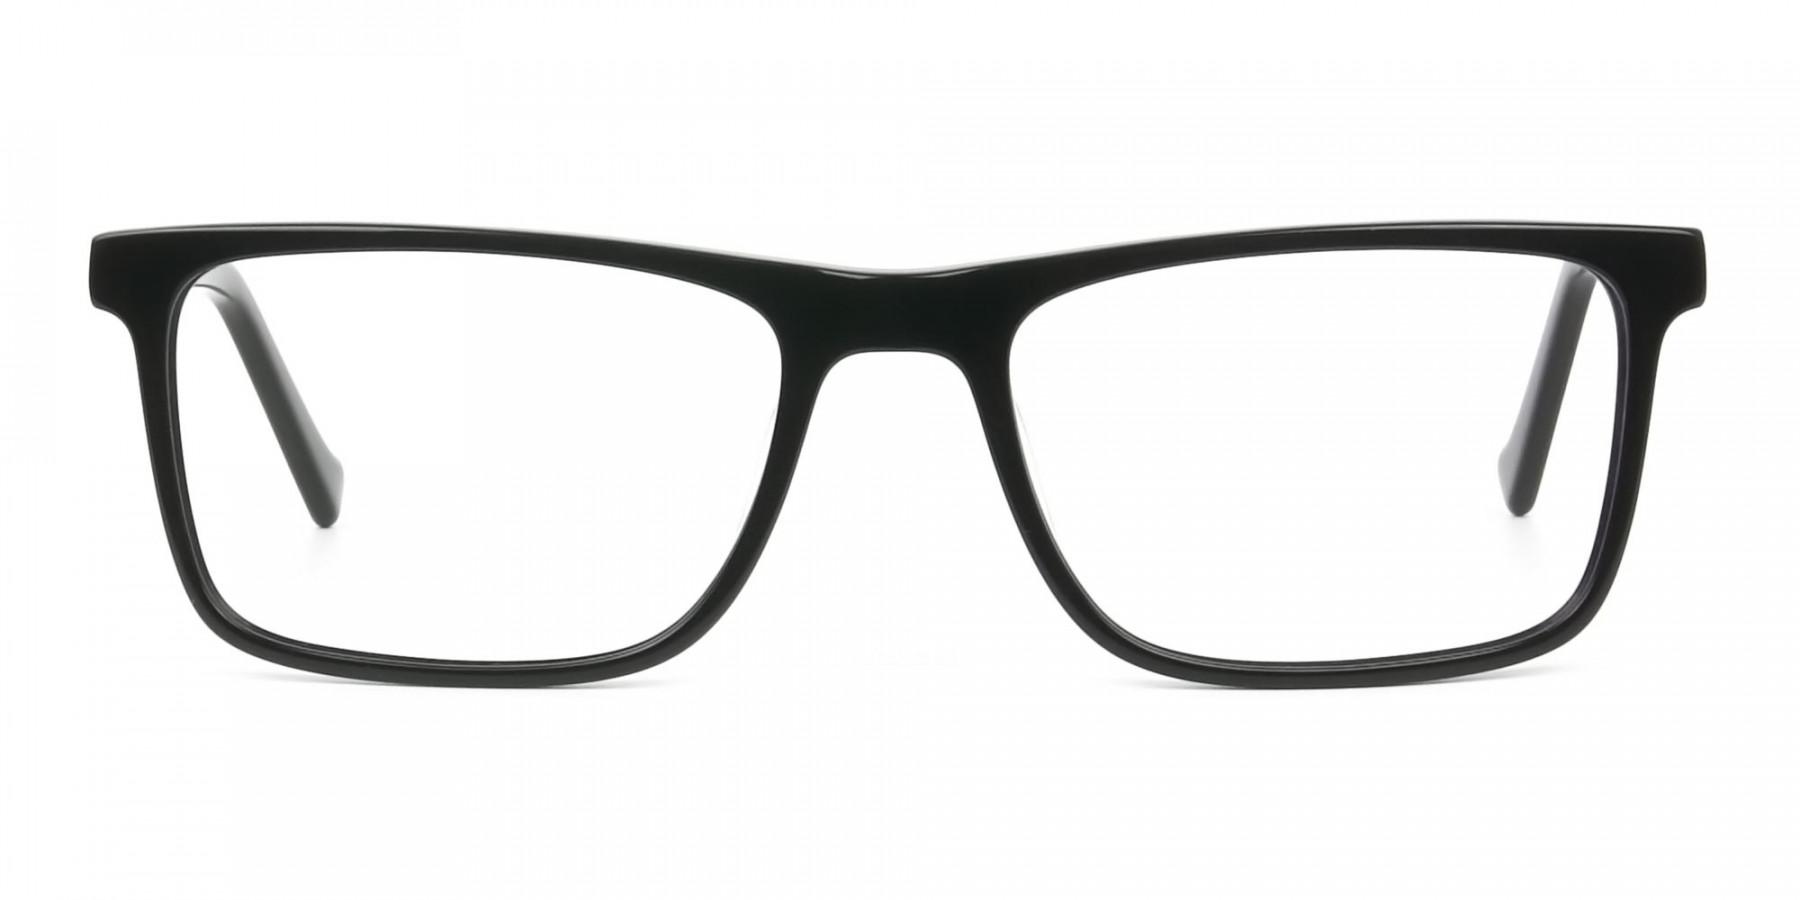 Round Temple Tip Glossy Black Eyeglasses Rectangular - 1